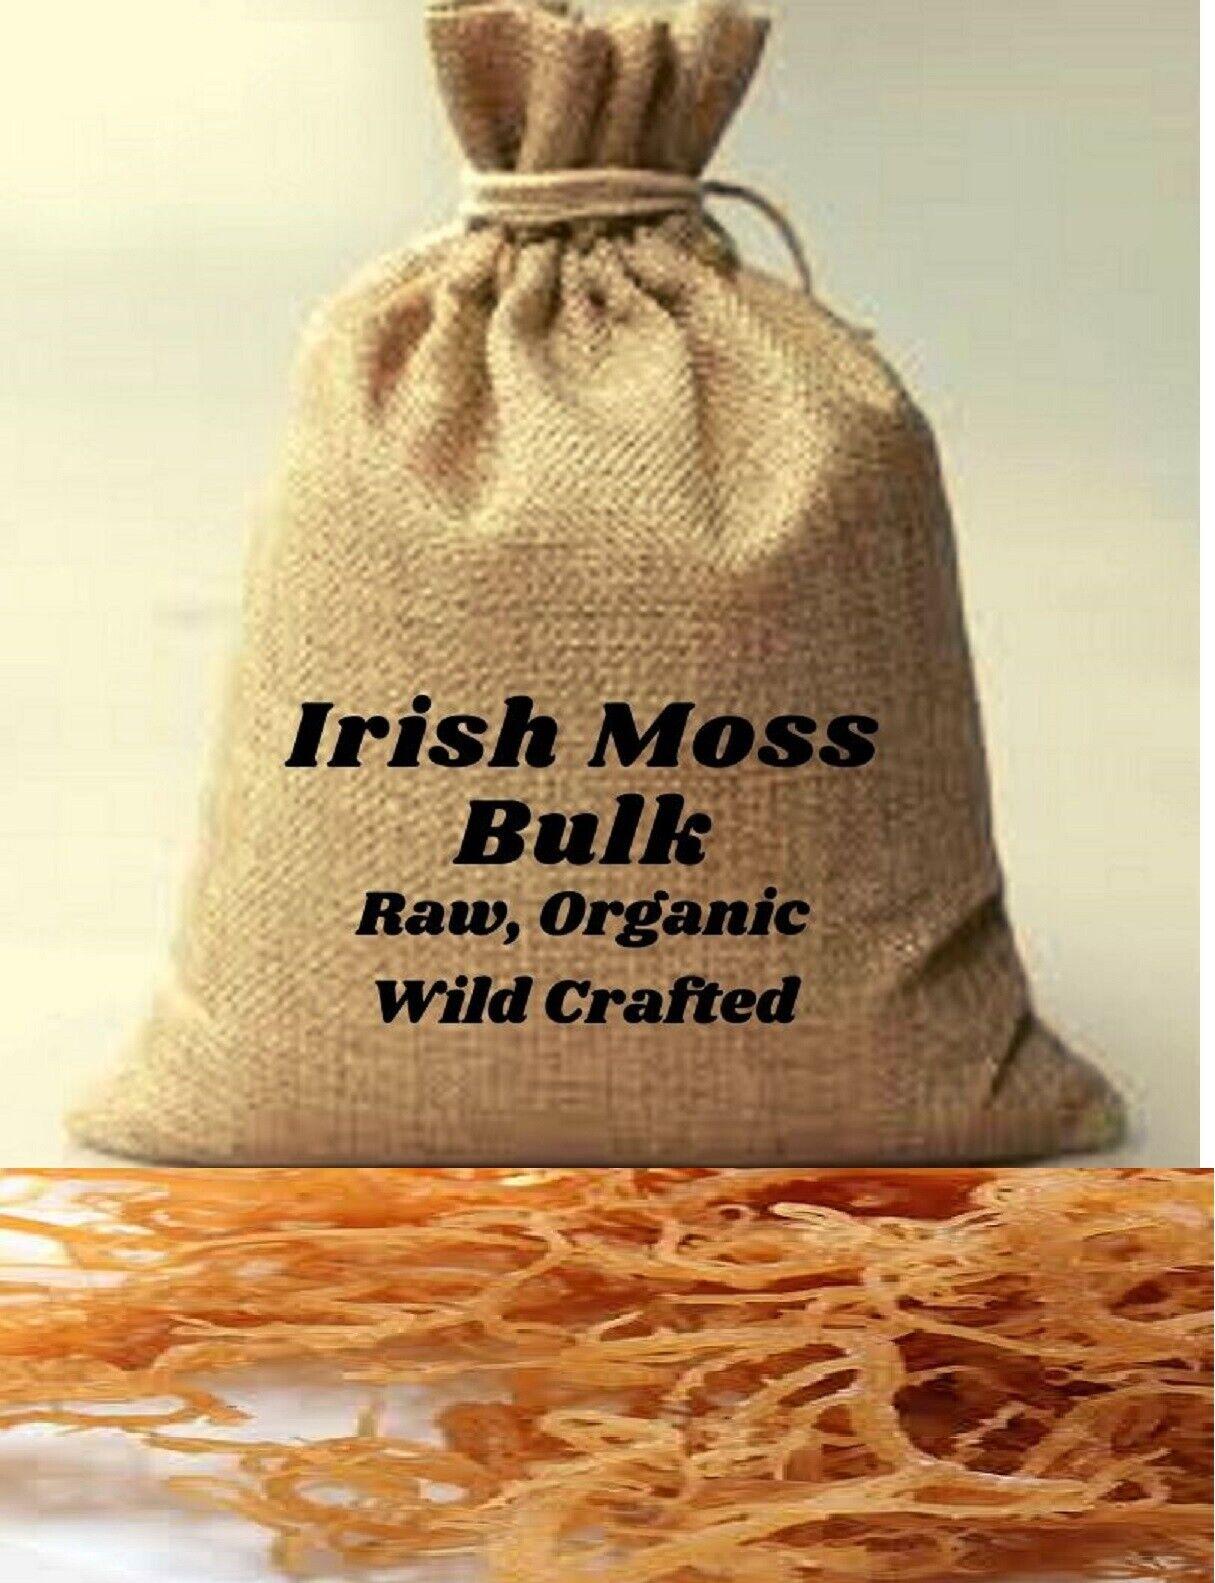 Whole Leaf Irish Moss Sea Moss + Bulk buy and Save $$ Wholesale Prices Free Ship